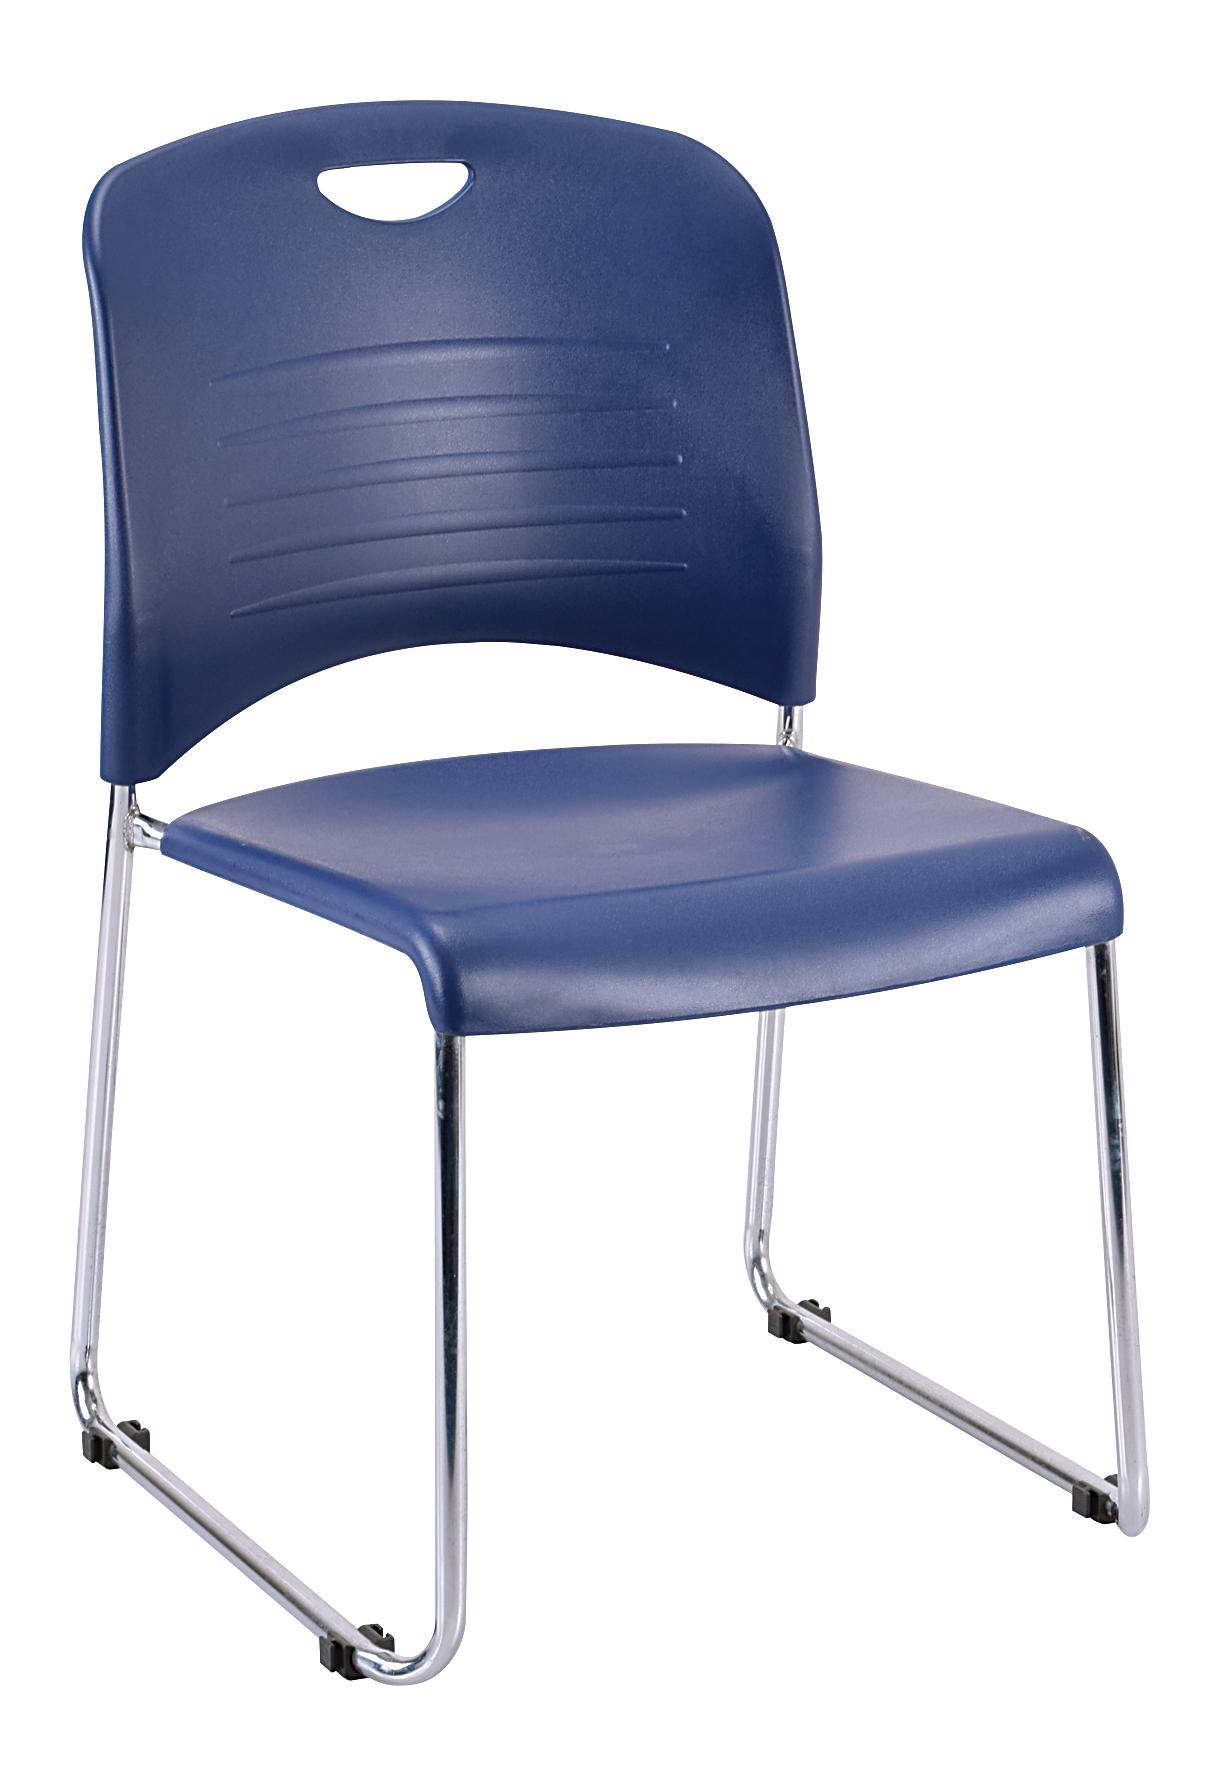 "18"" x 22.5"" x 33.5"" Navy Plastic Guest Chair"